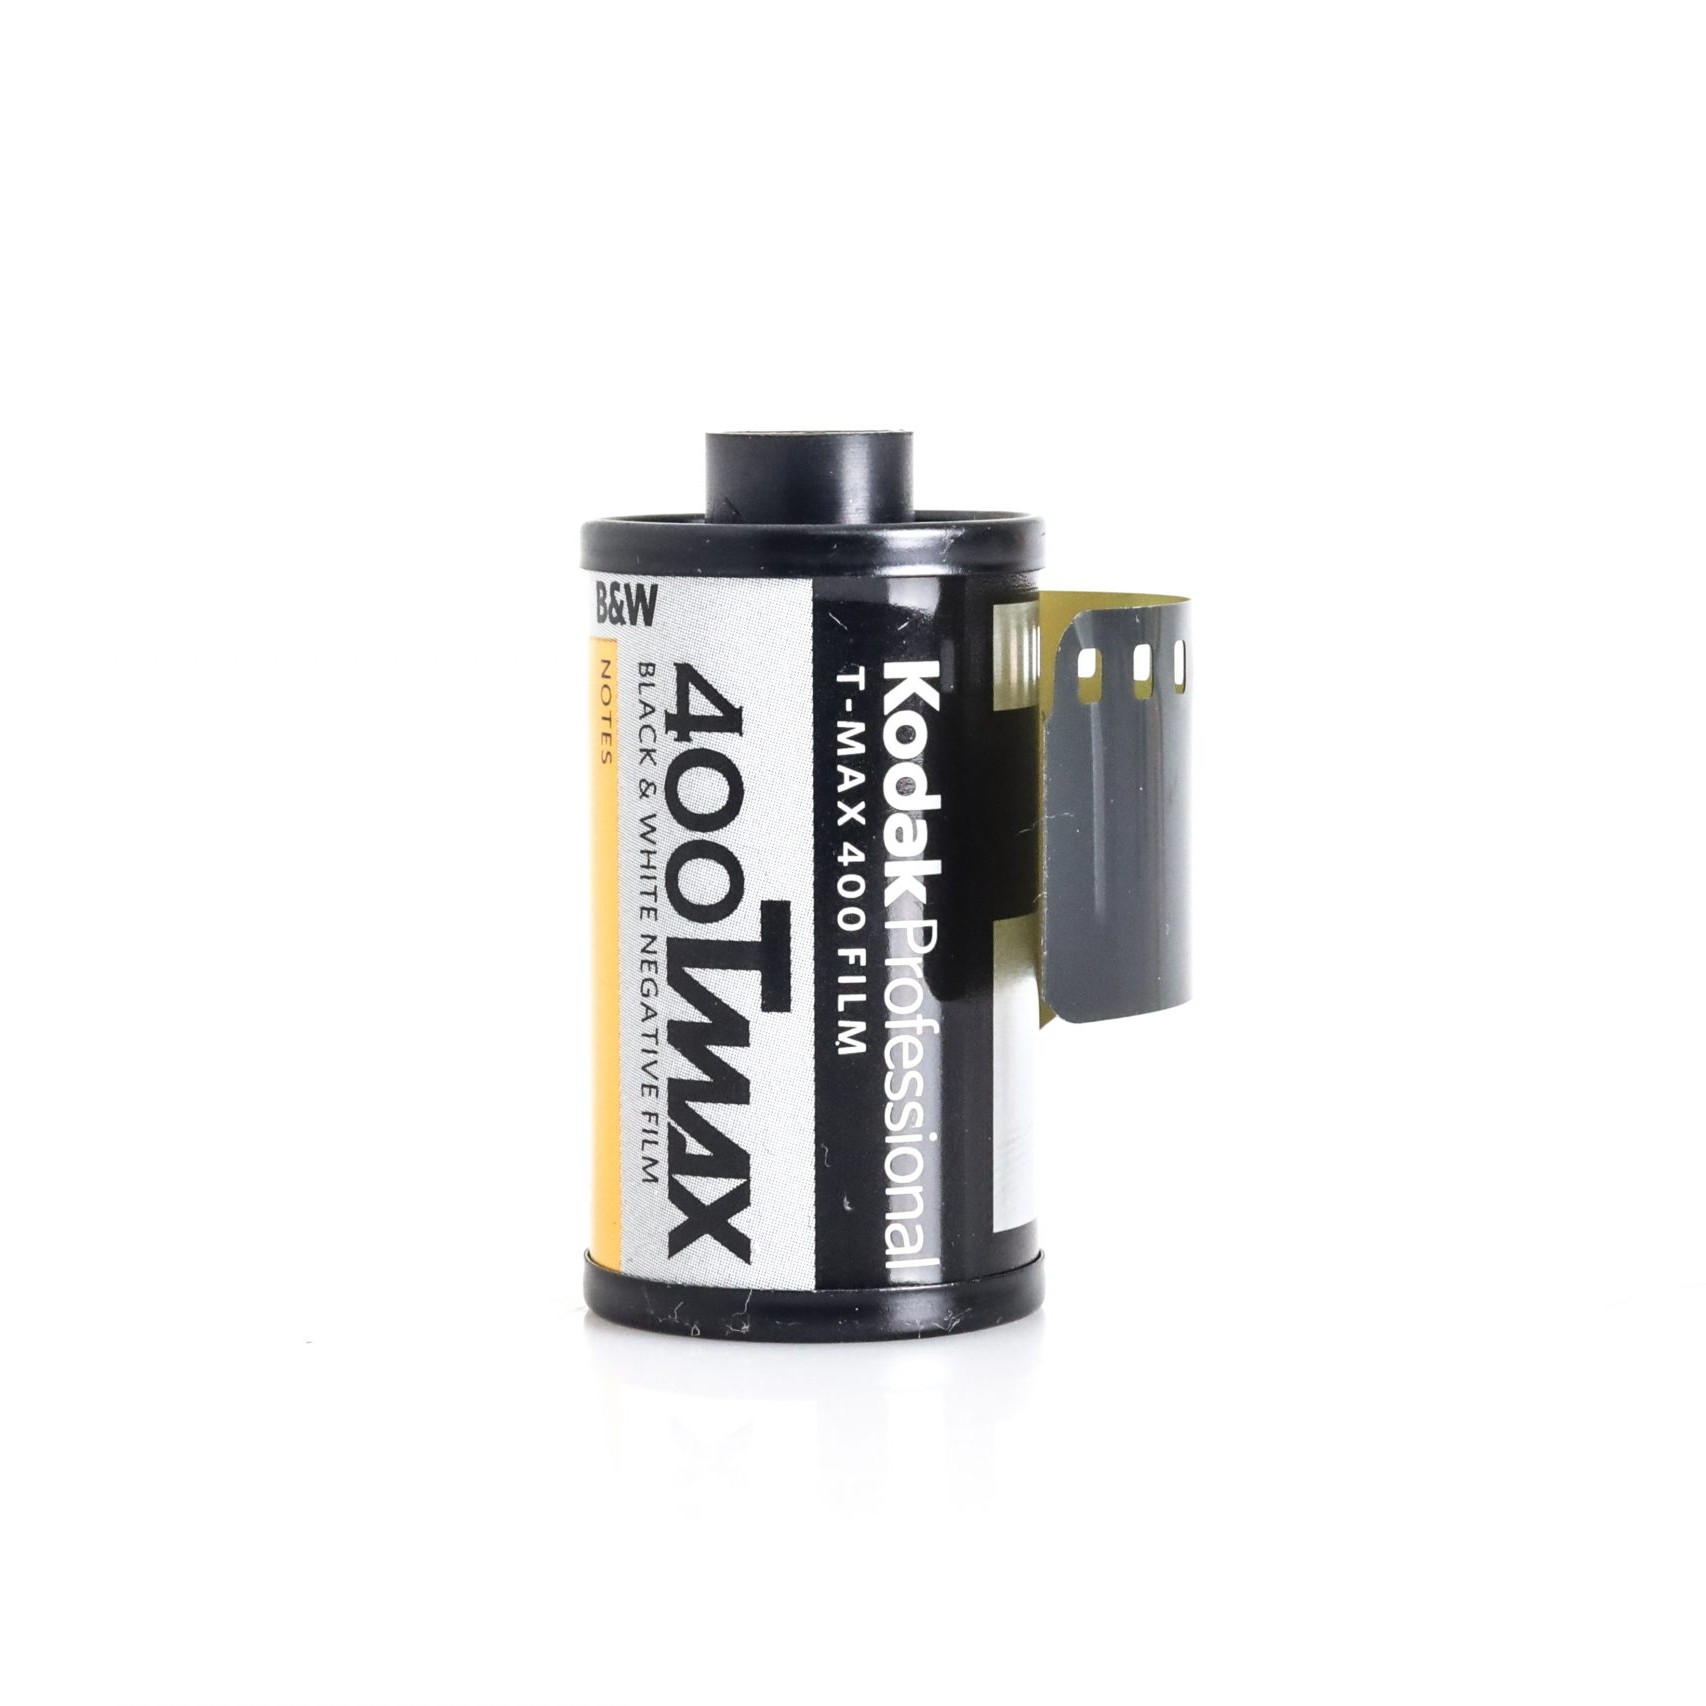 Expired Kodak Professional 35 Exposure 400 TMAX 35mm Black and White Film, Expired 2016